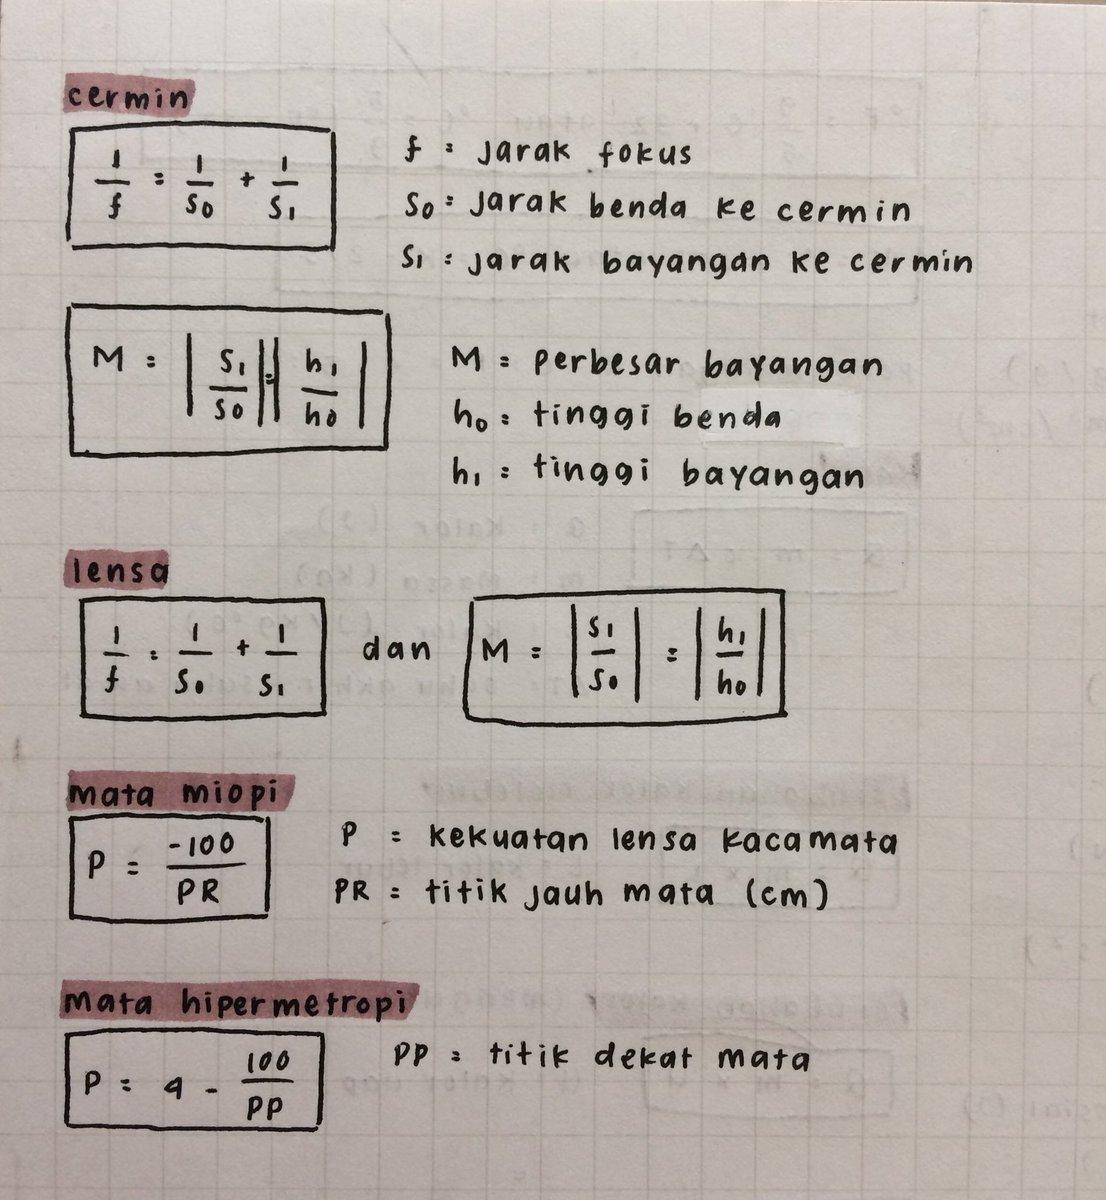 Mulai dari kecil kita diharuskan belajar menghitung angka 1. Nadha On Twitter Kumpulan Rumus Matematika